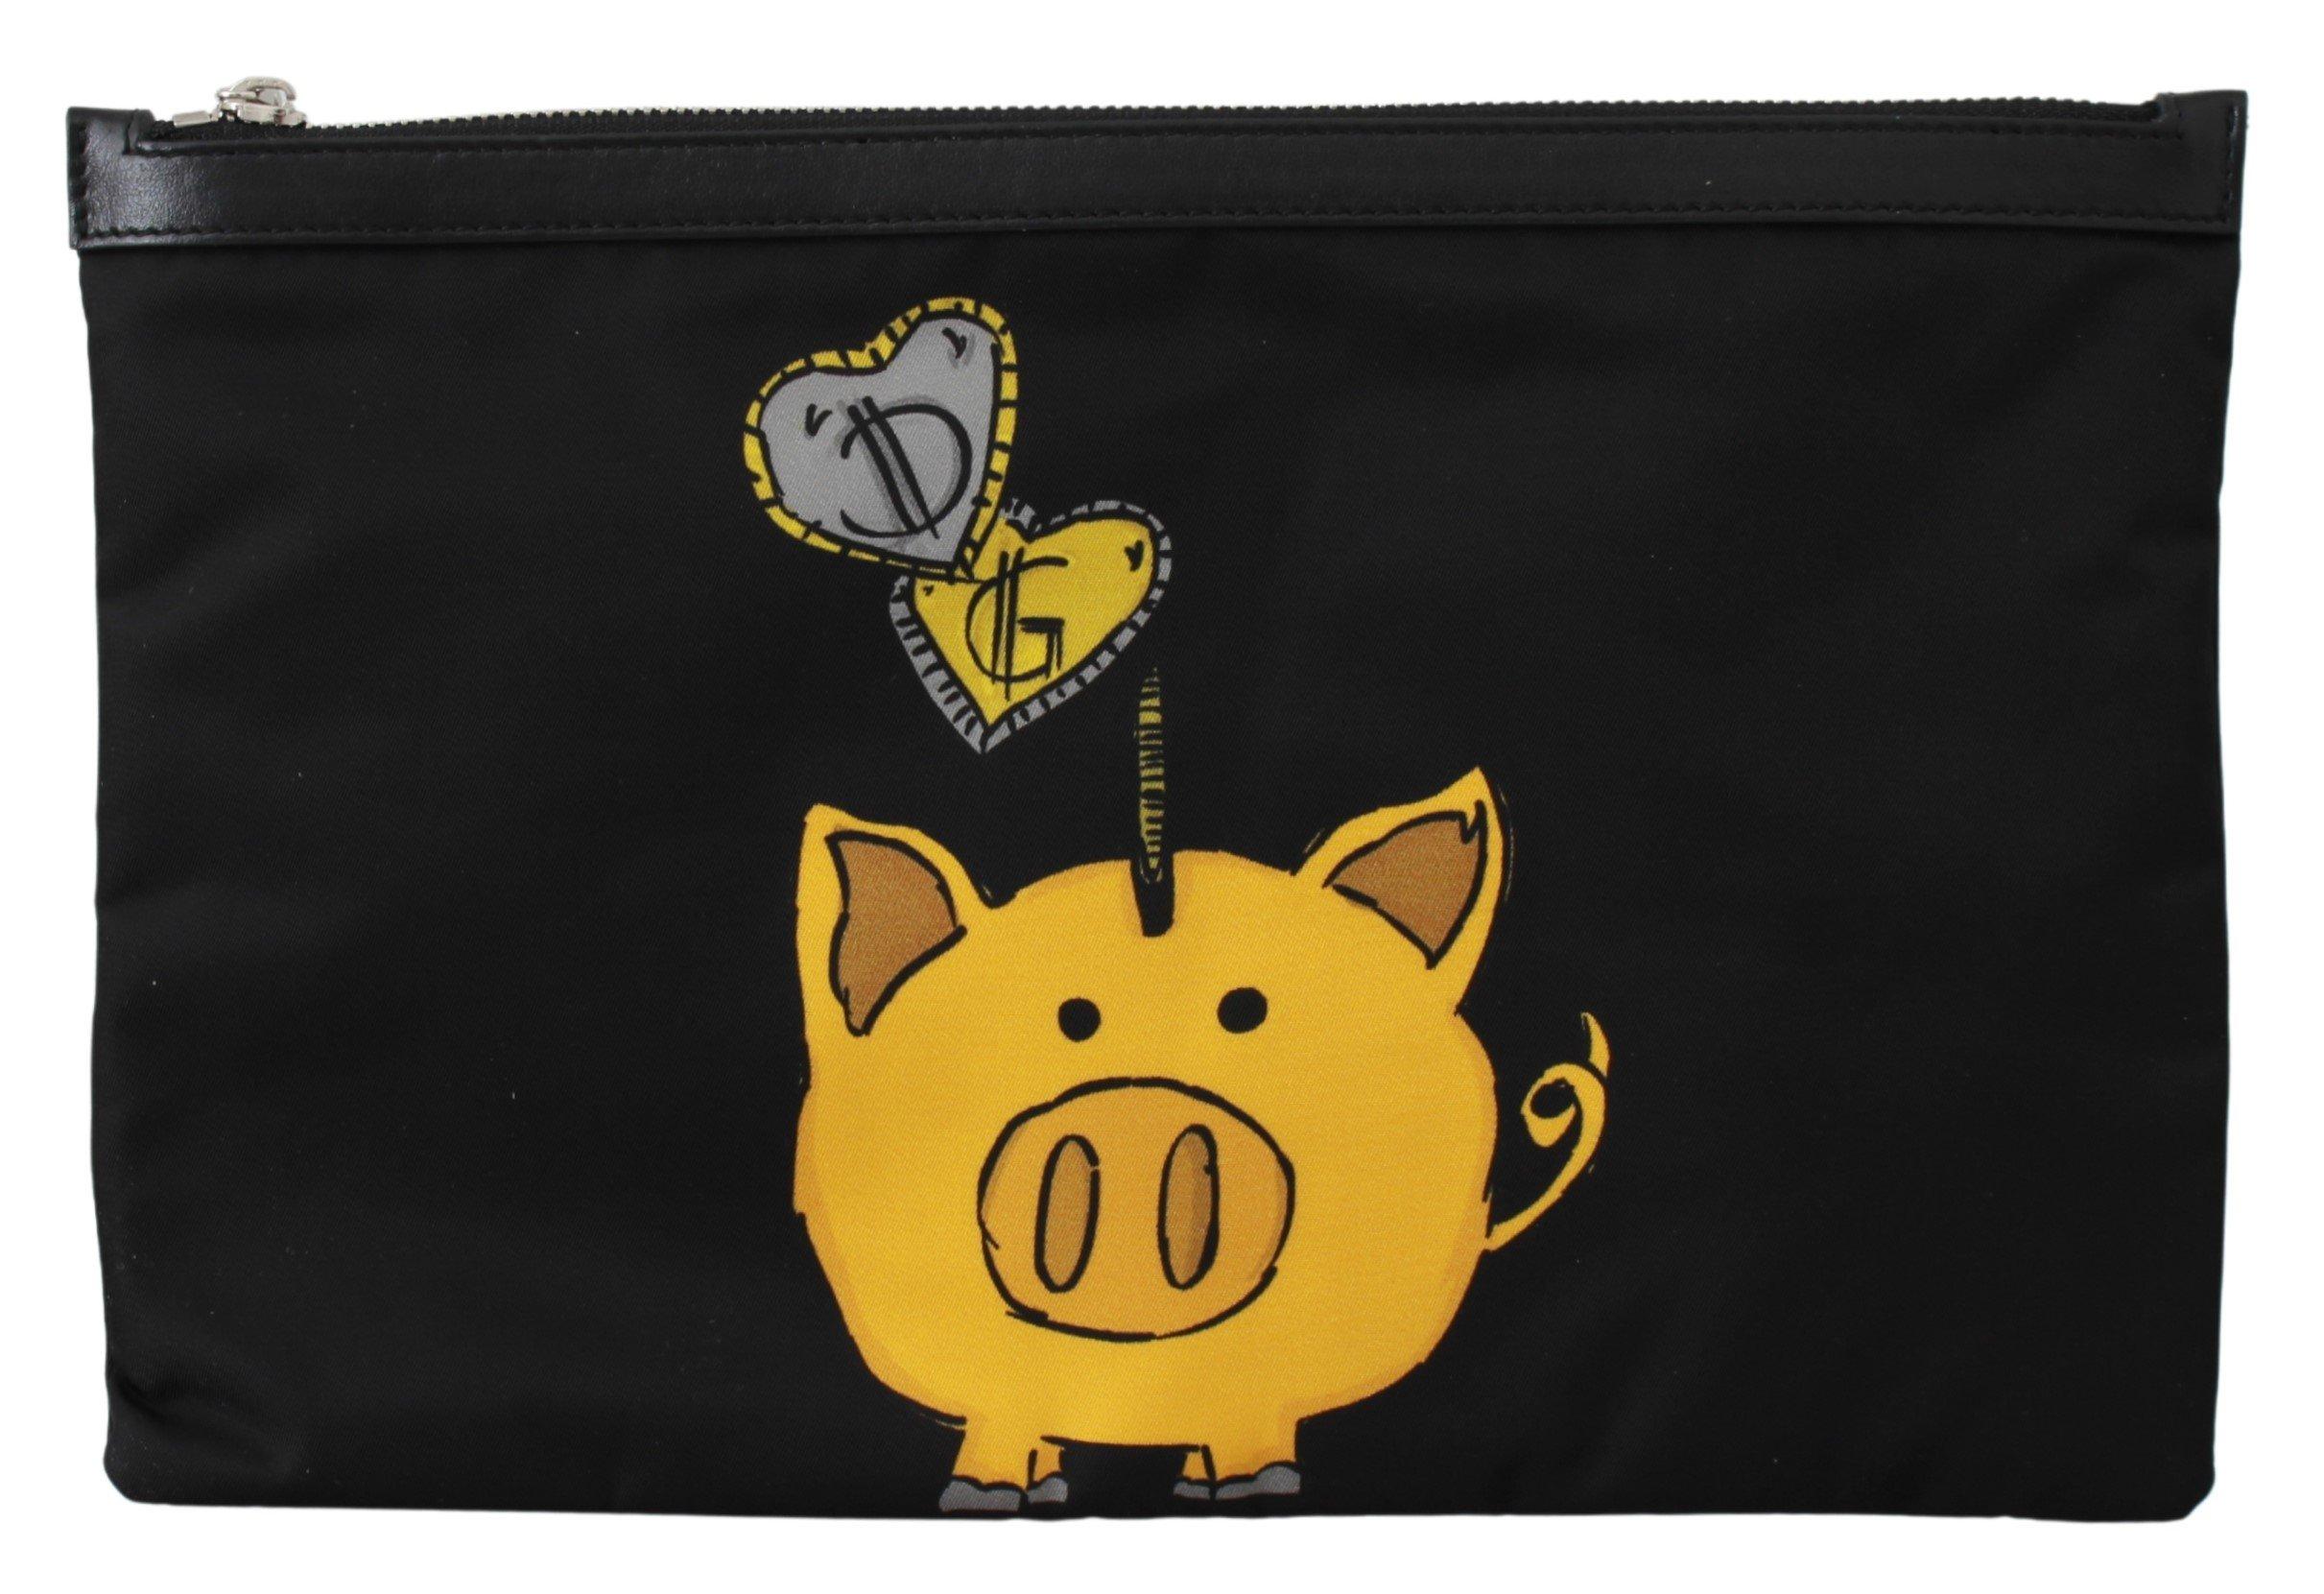 Dolce & Gabbana Men's Pig of the Year Coin Messenger Bag Black VAS9491